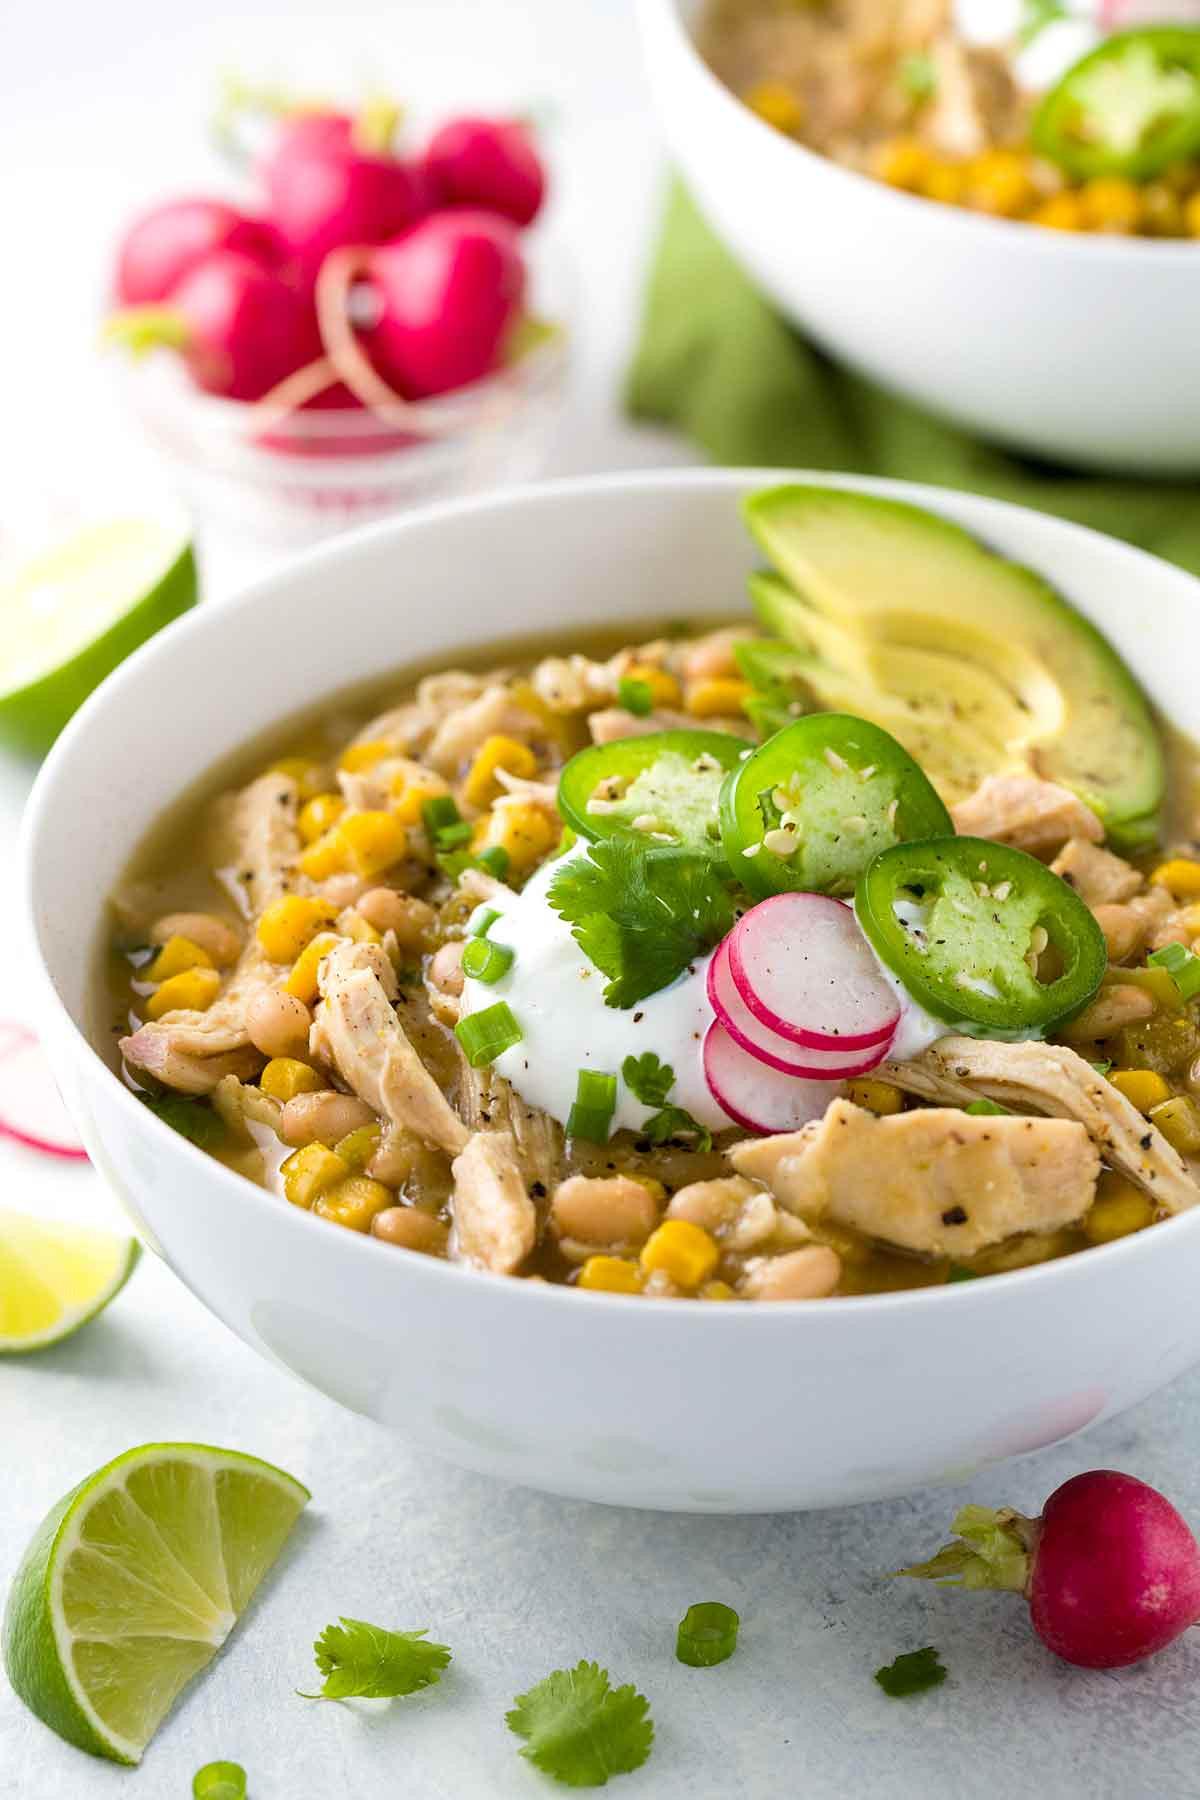 Healthy Chicken Chili  White Bean Chicken Chili Crockpot Recipe